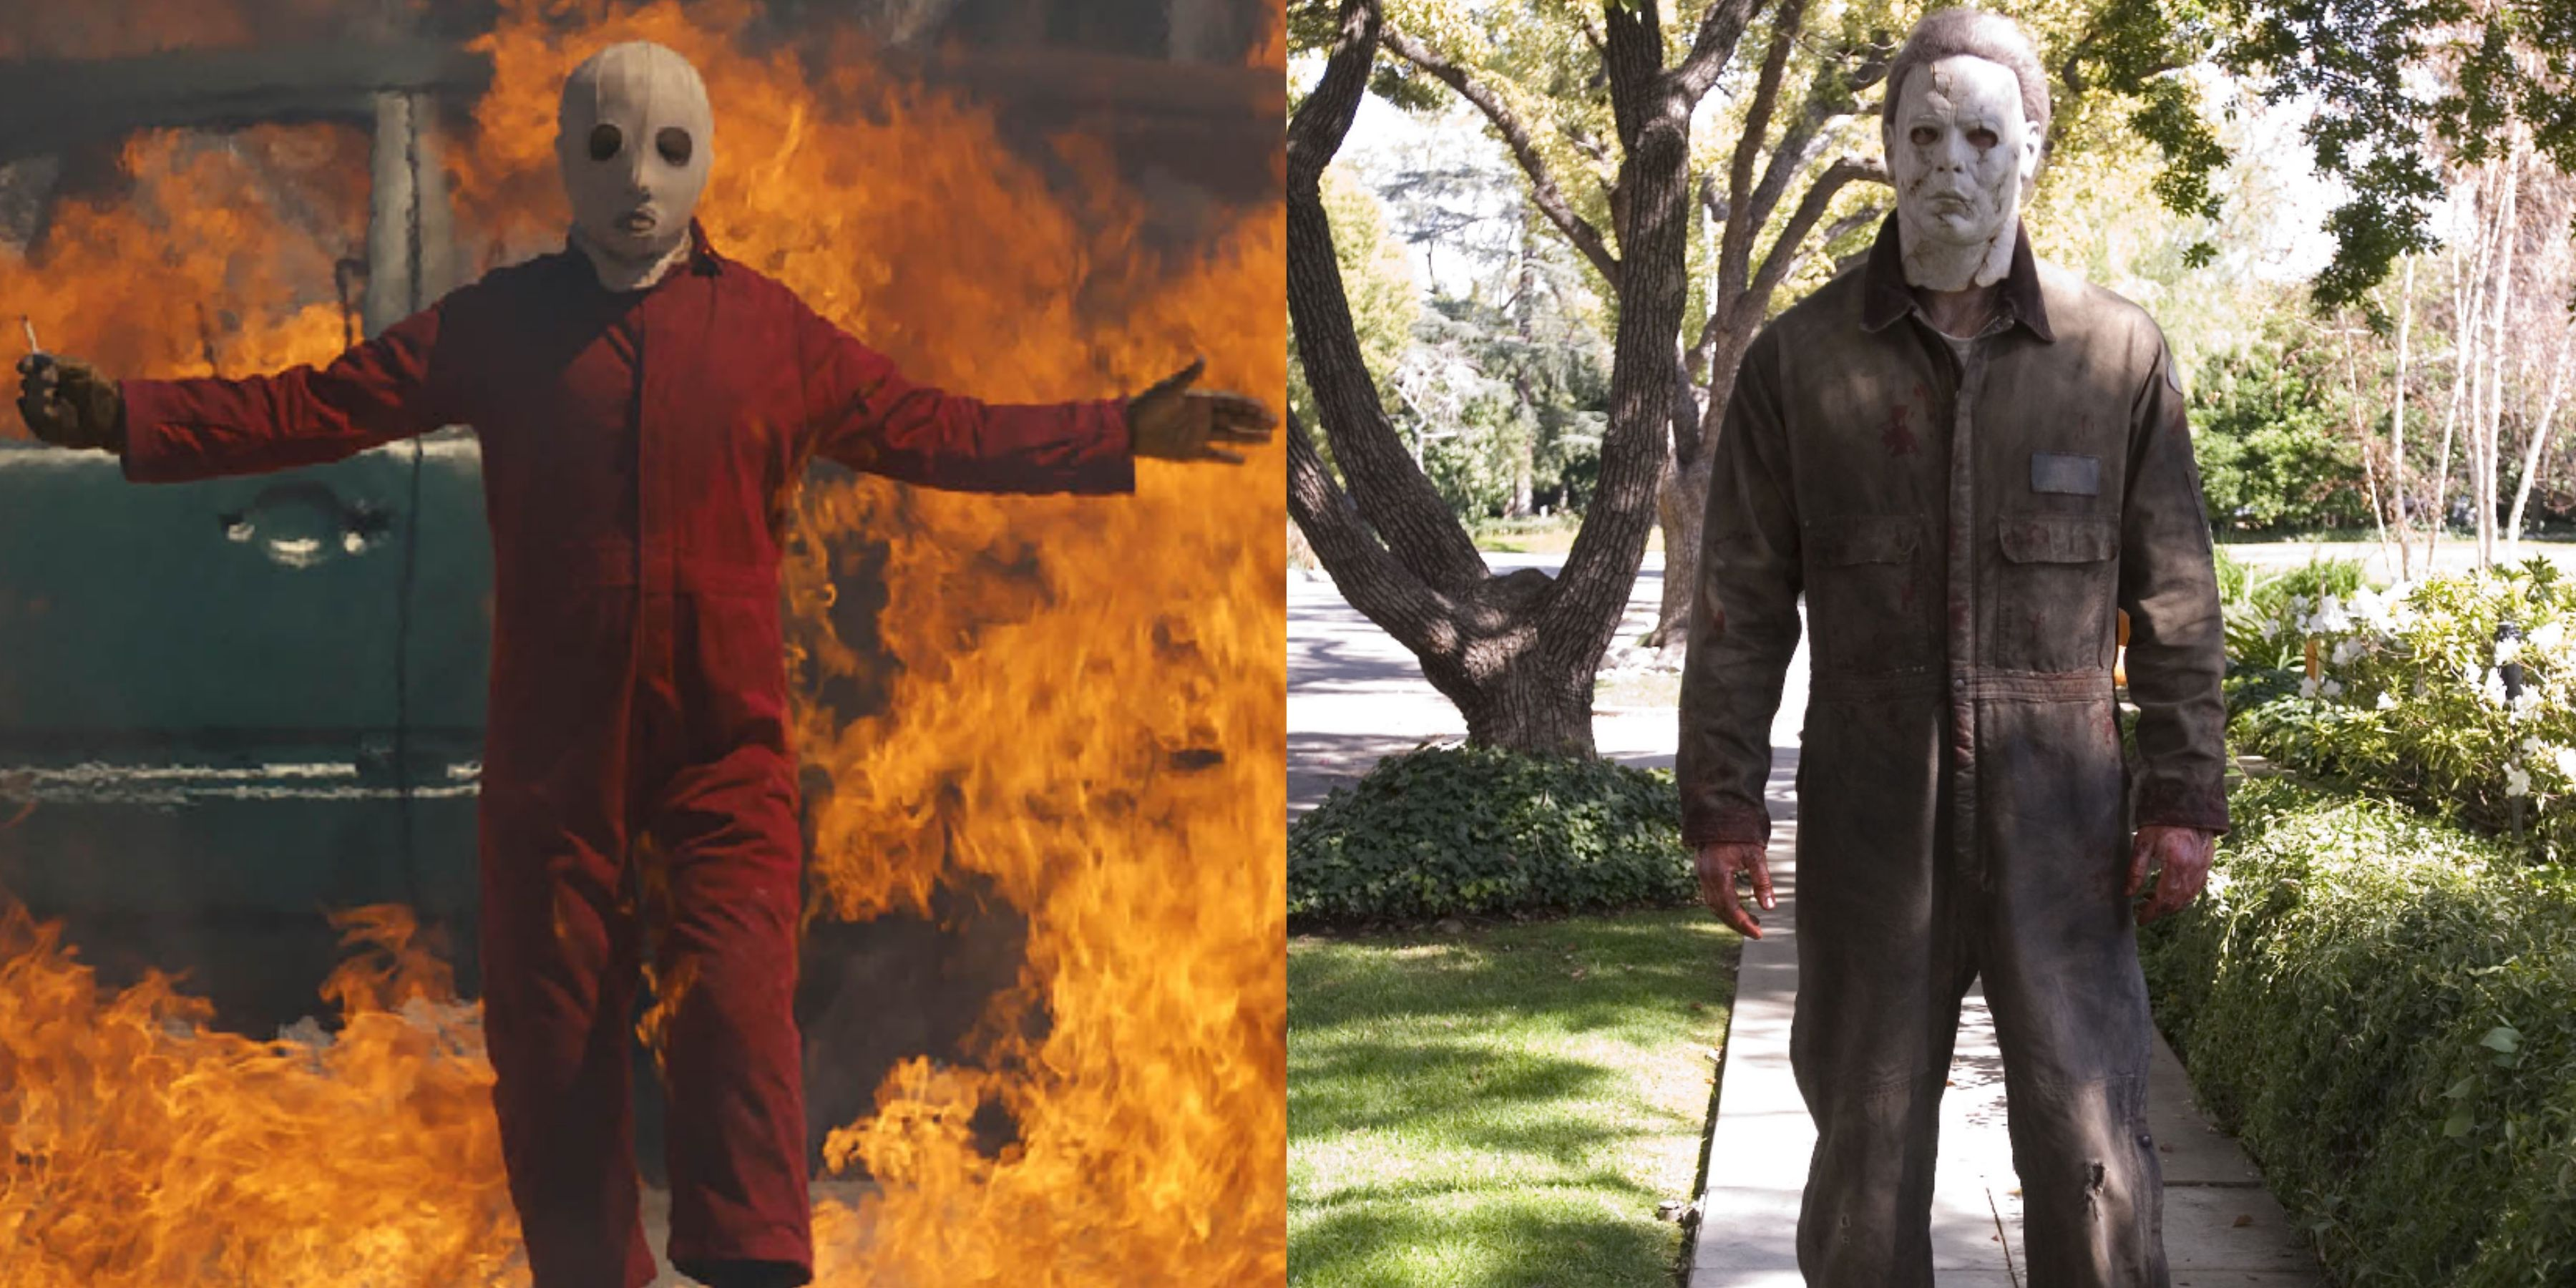 Us Movie Halloween Theory , Is Michael Myers a Tethered From Jordan Peele\u0027s  Film?